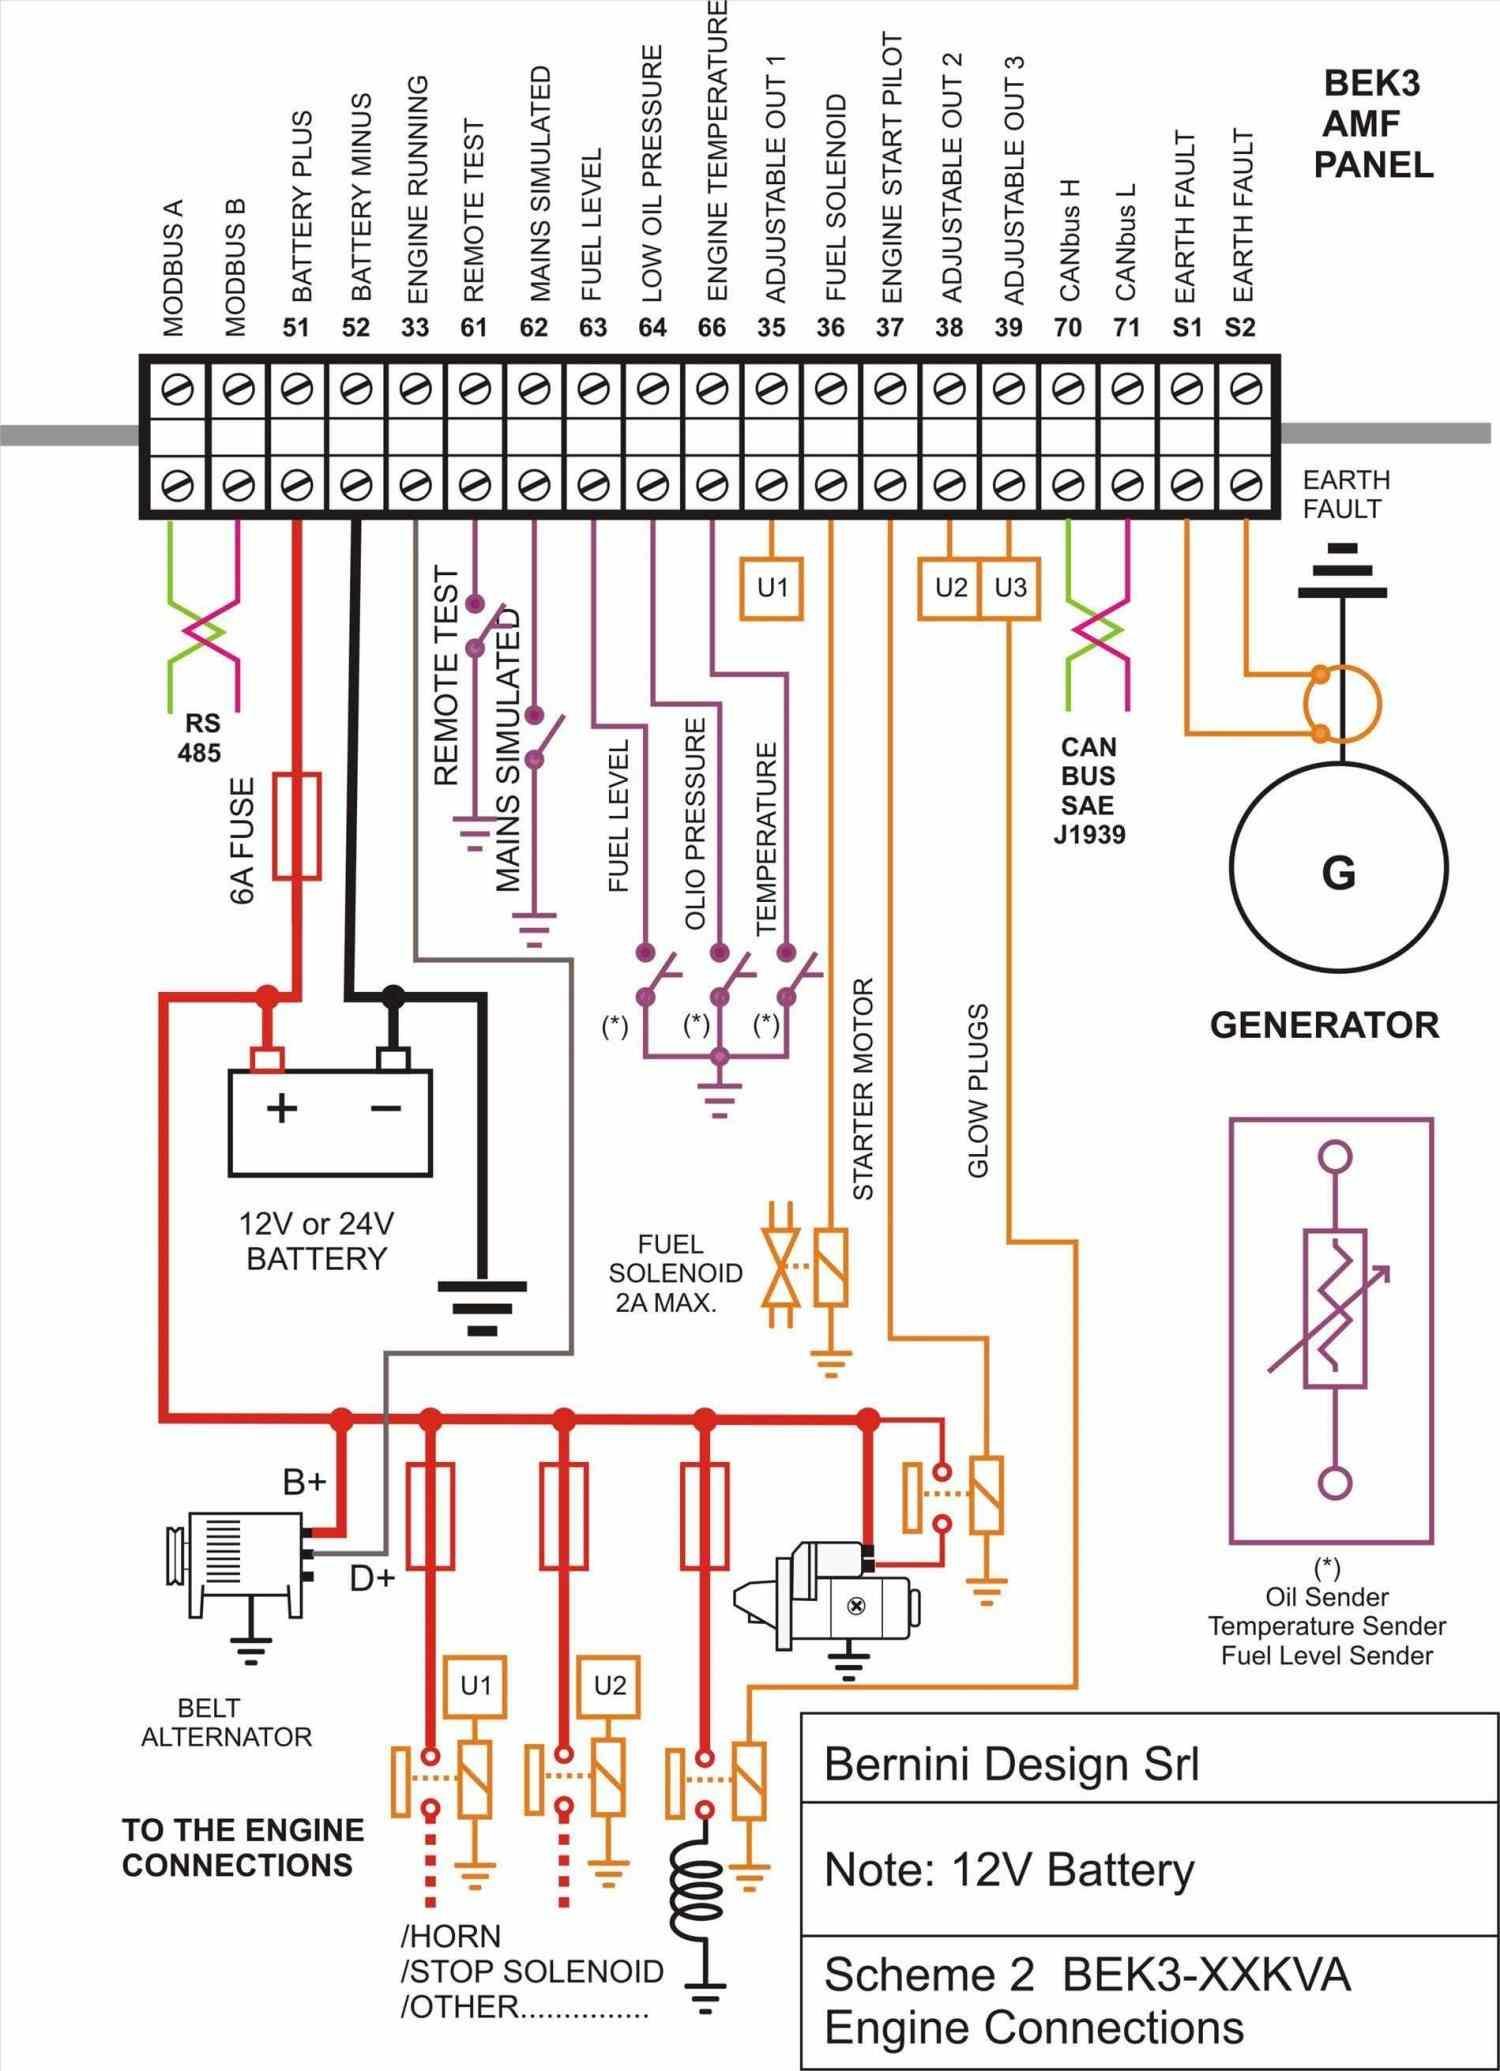 Honeywell Gas Furnace Thermostat Wiring Diagram | Wiring Diagram - Furnace Thermostat Wiring Diagram